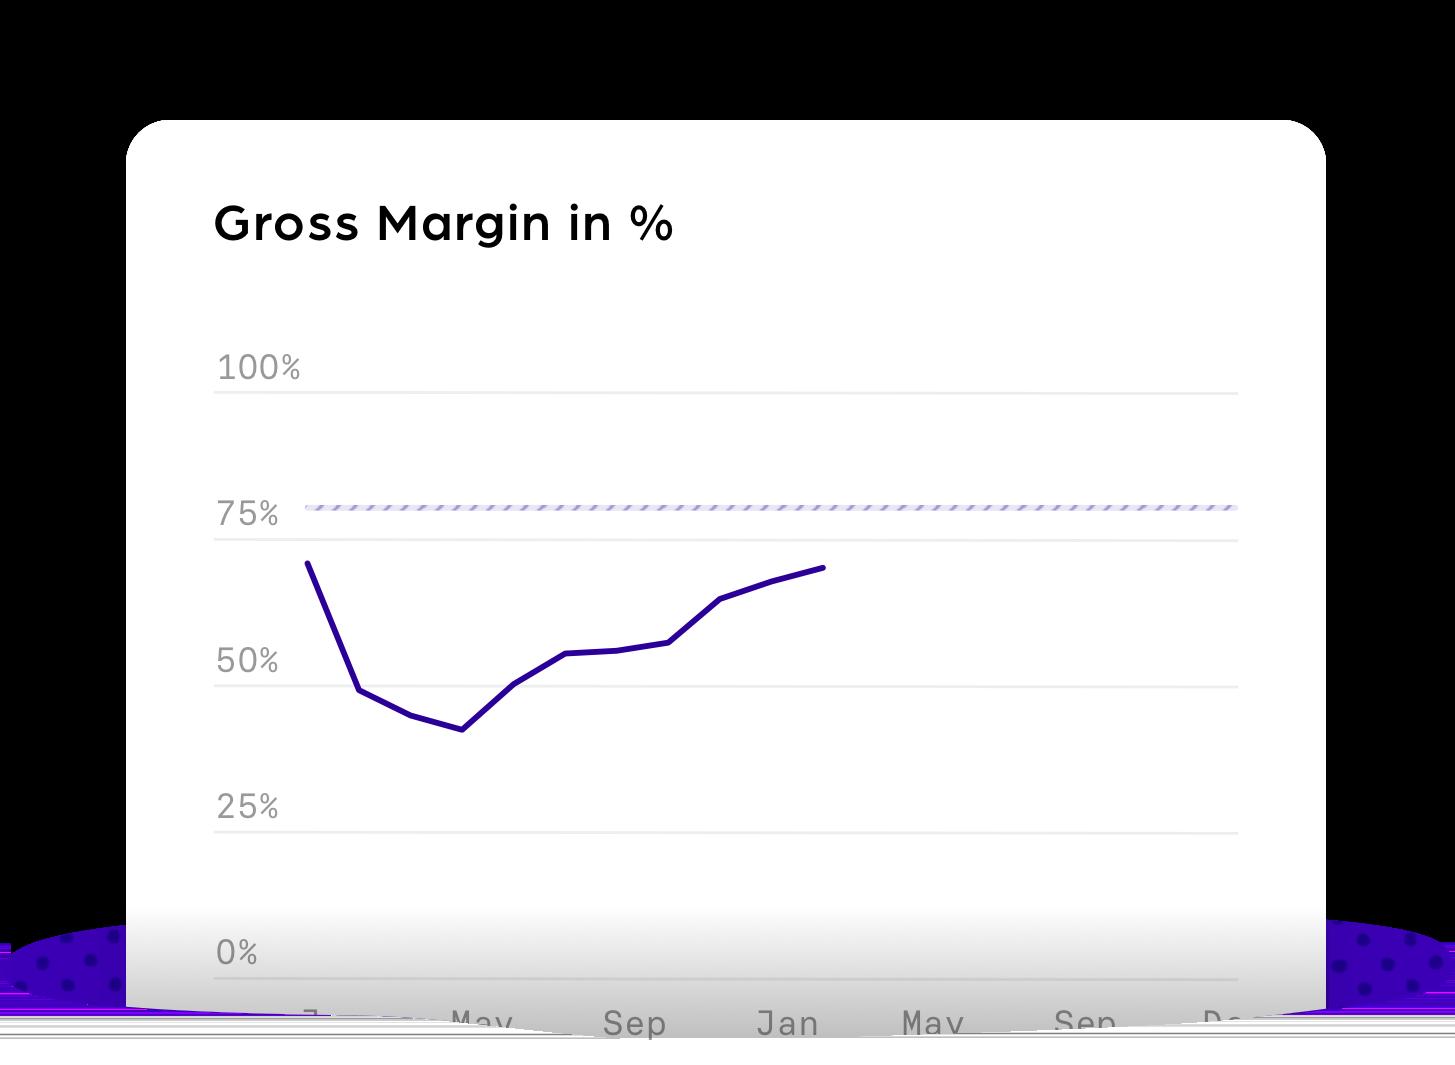 Gross Margin percentage@3x